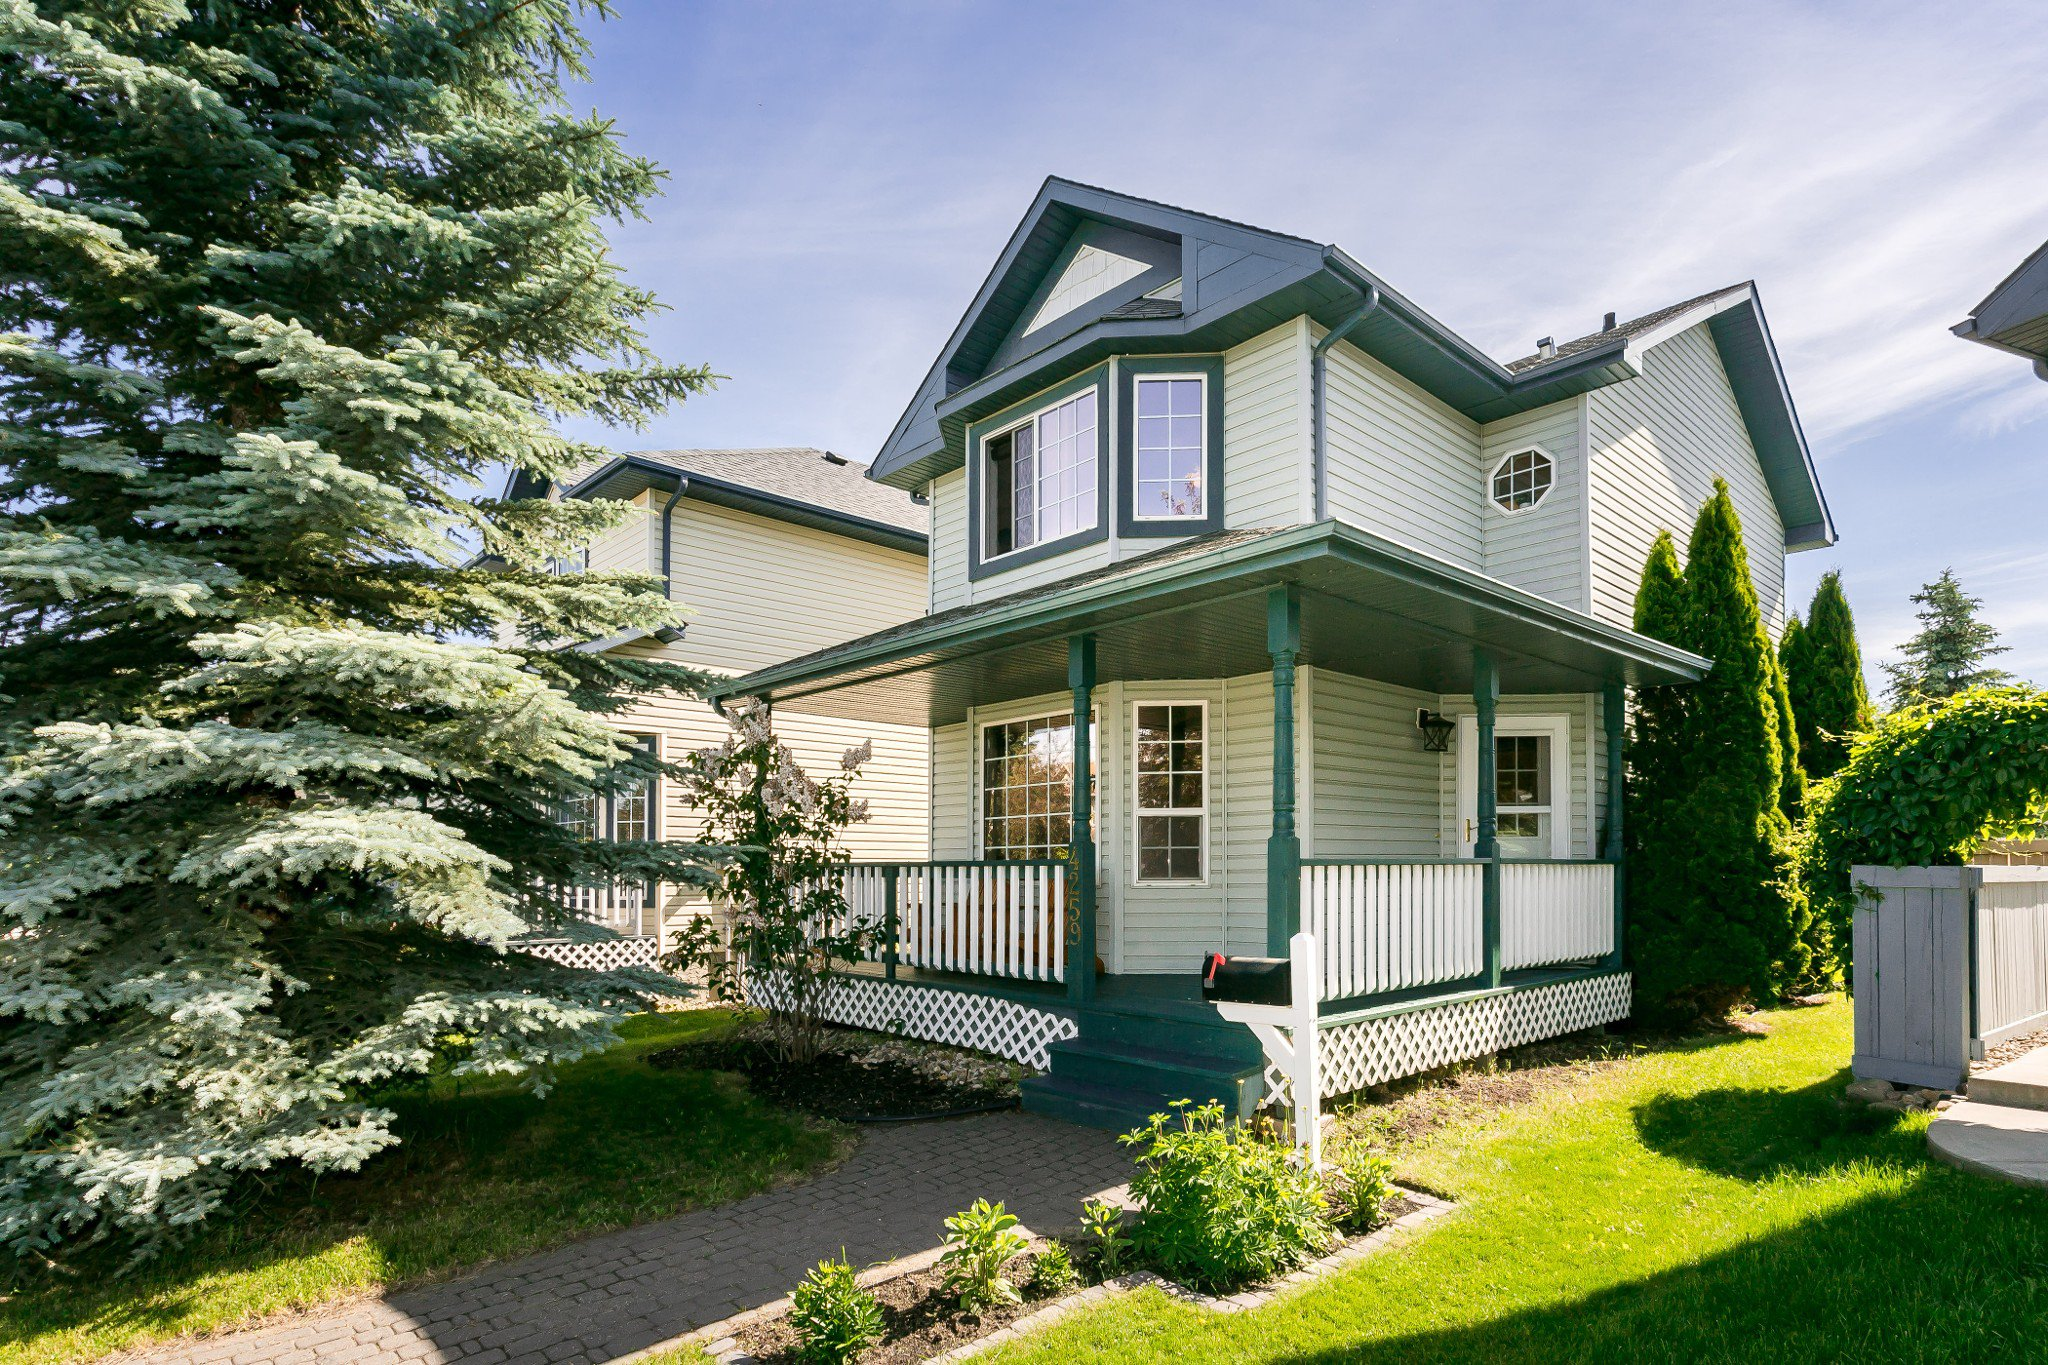 Main Photo: 4259 23St in EDMONTON: House for sale (Edmonton)  : MLS®# E4203591